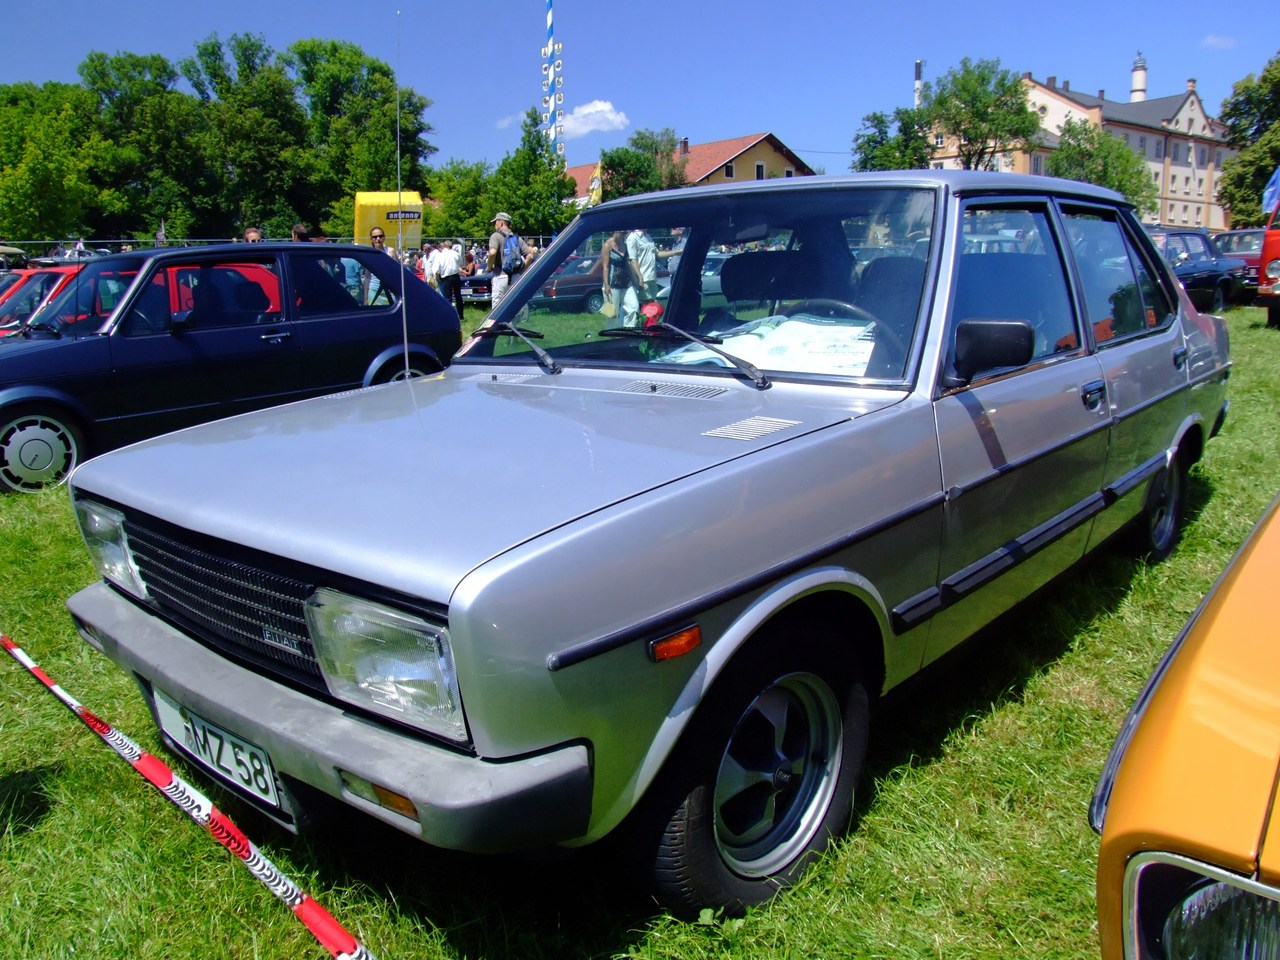 1979 fiat 131 supermirafiori 98ps?w=840 fiat history part iv 1966 1979 myn transport blog 2017 Fiat Spider at bayanpartner.co